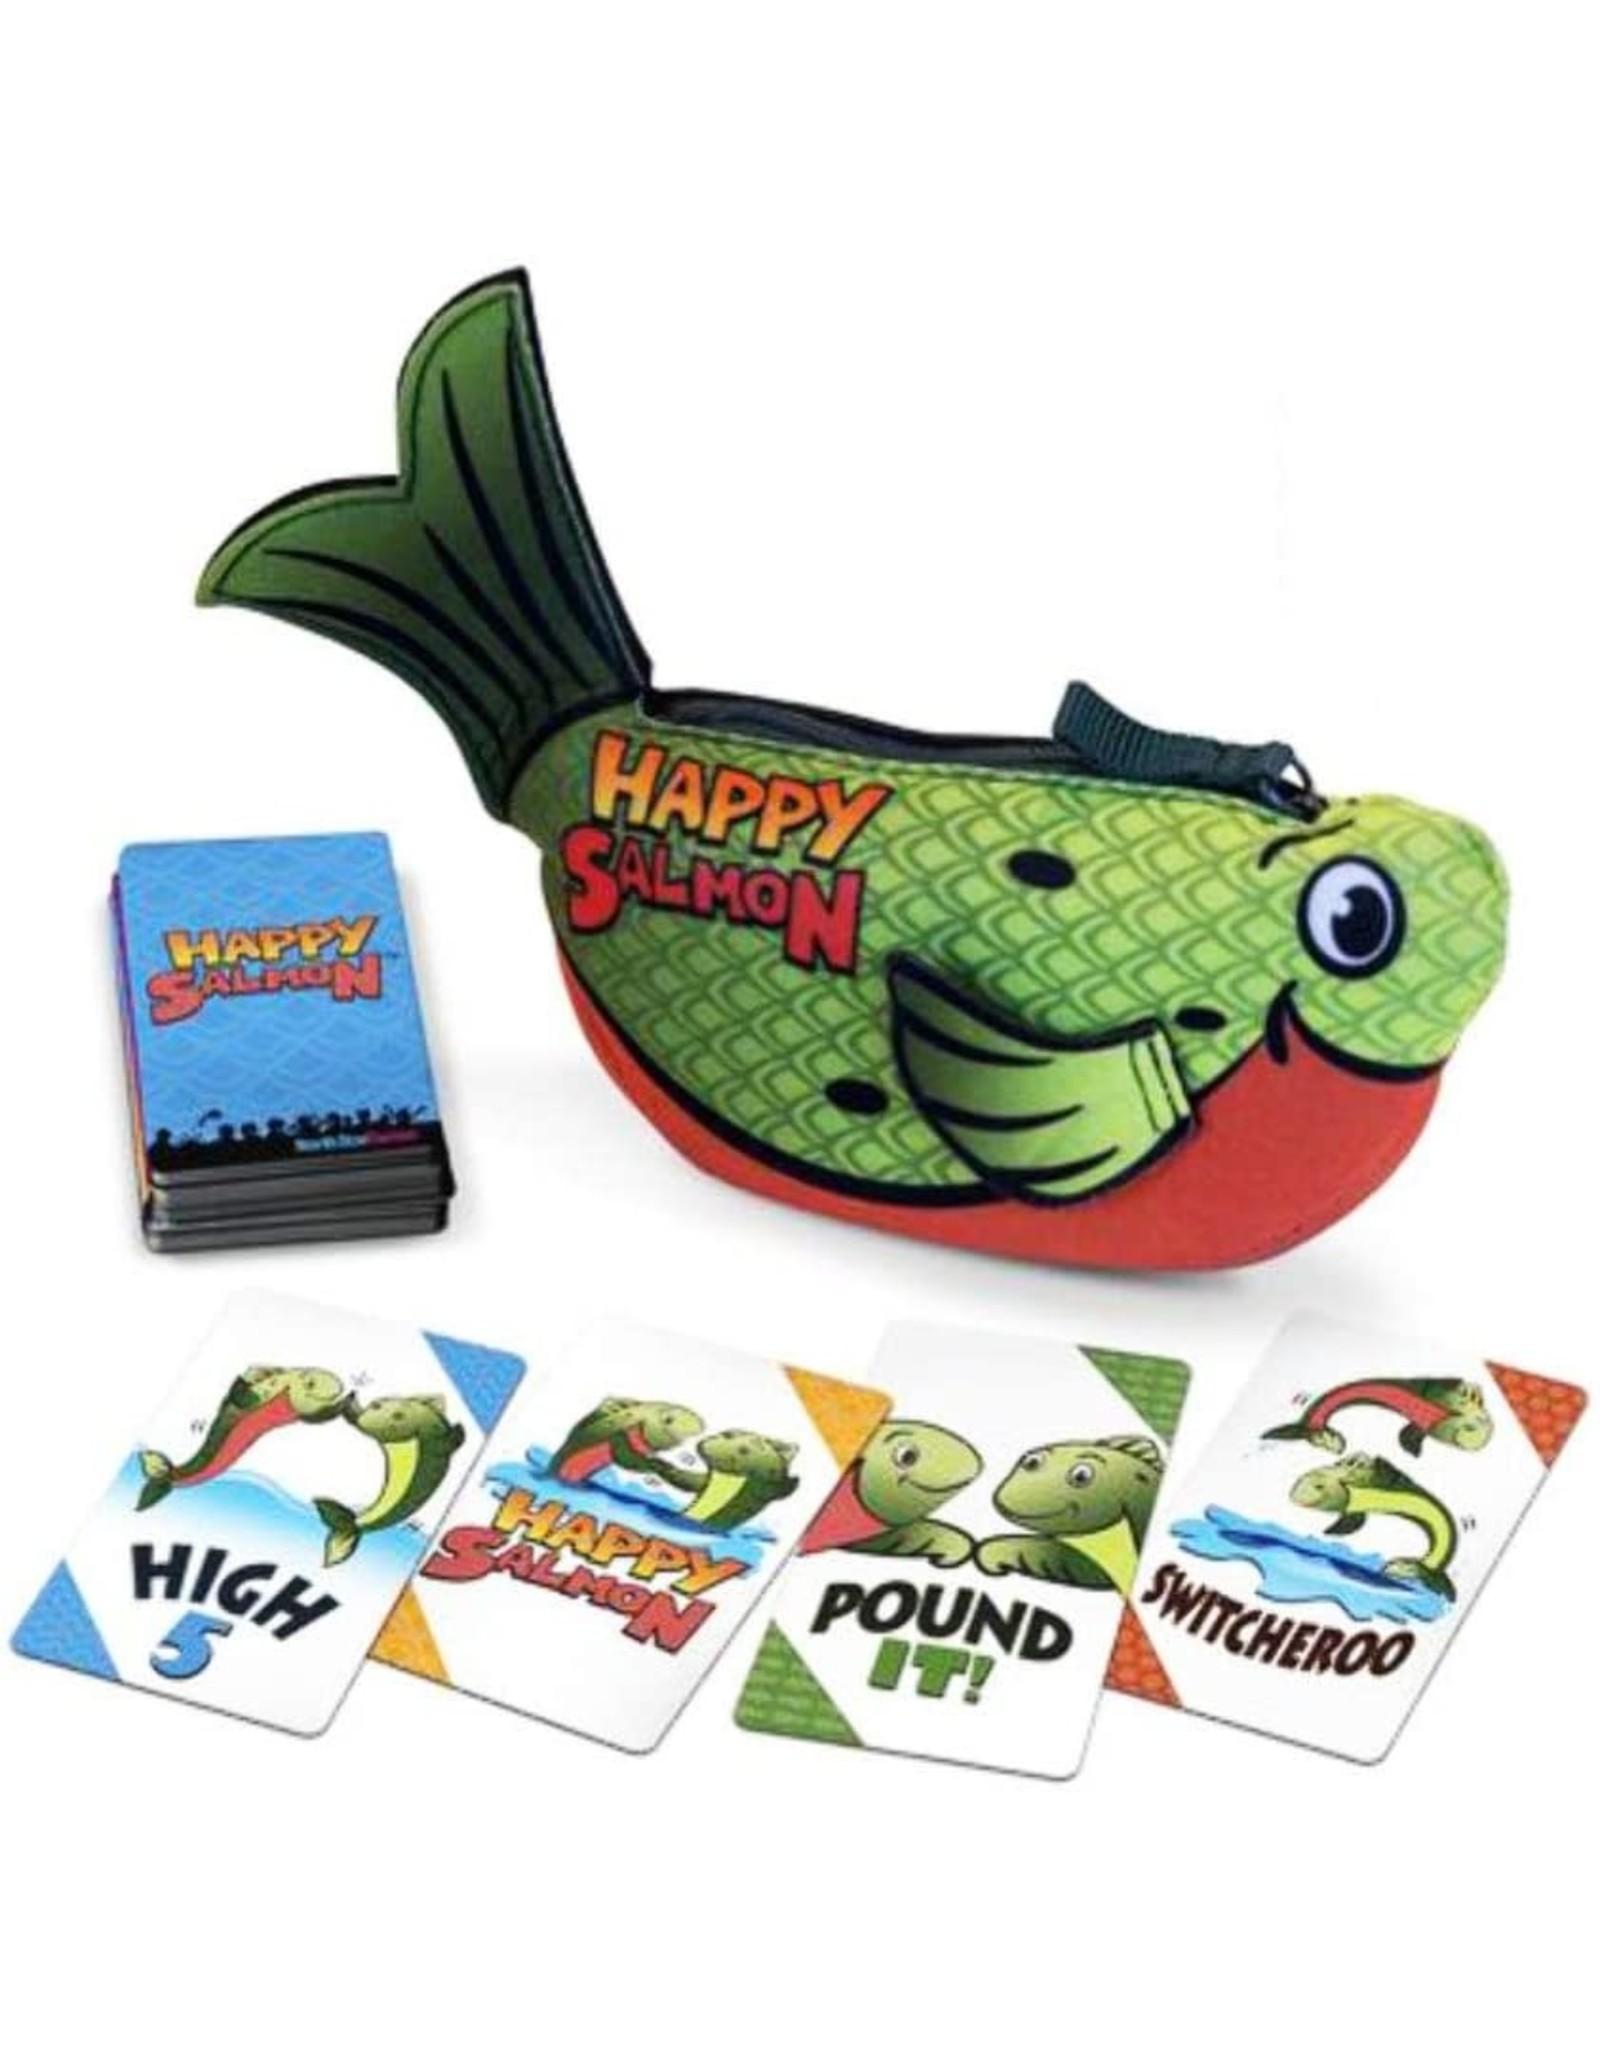 Card Game: Happy Salmon